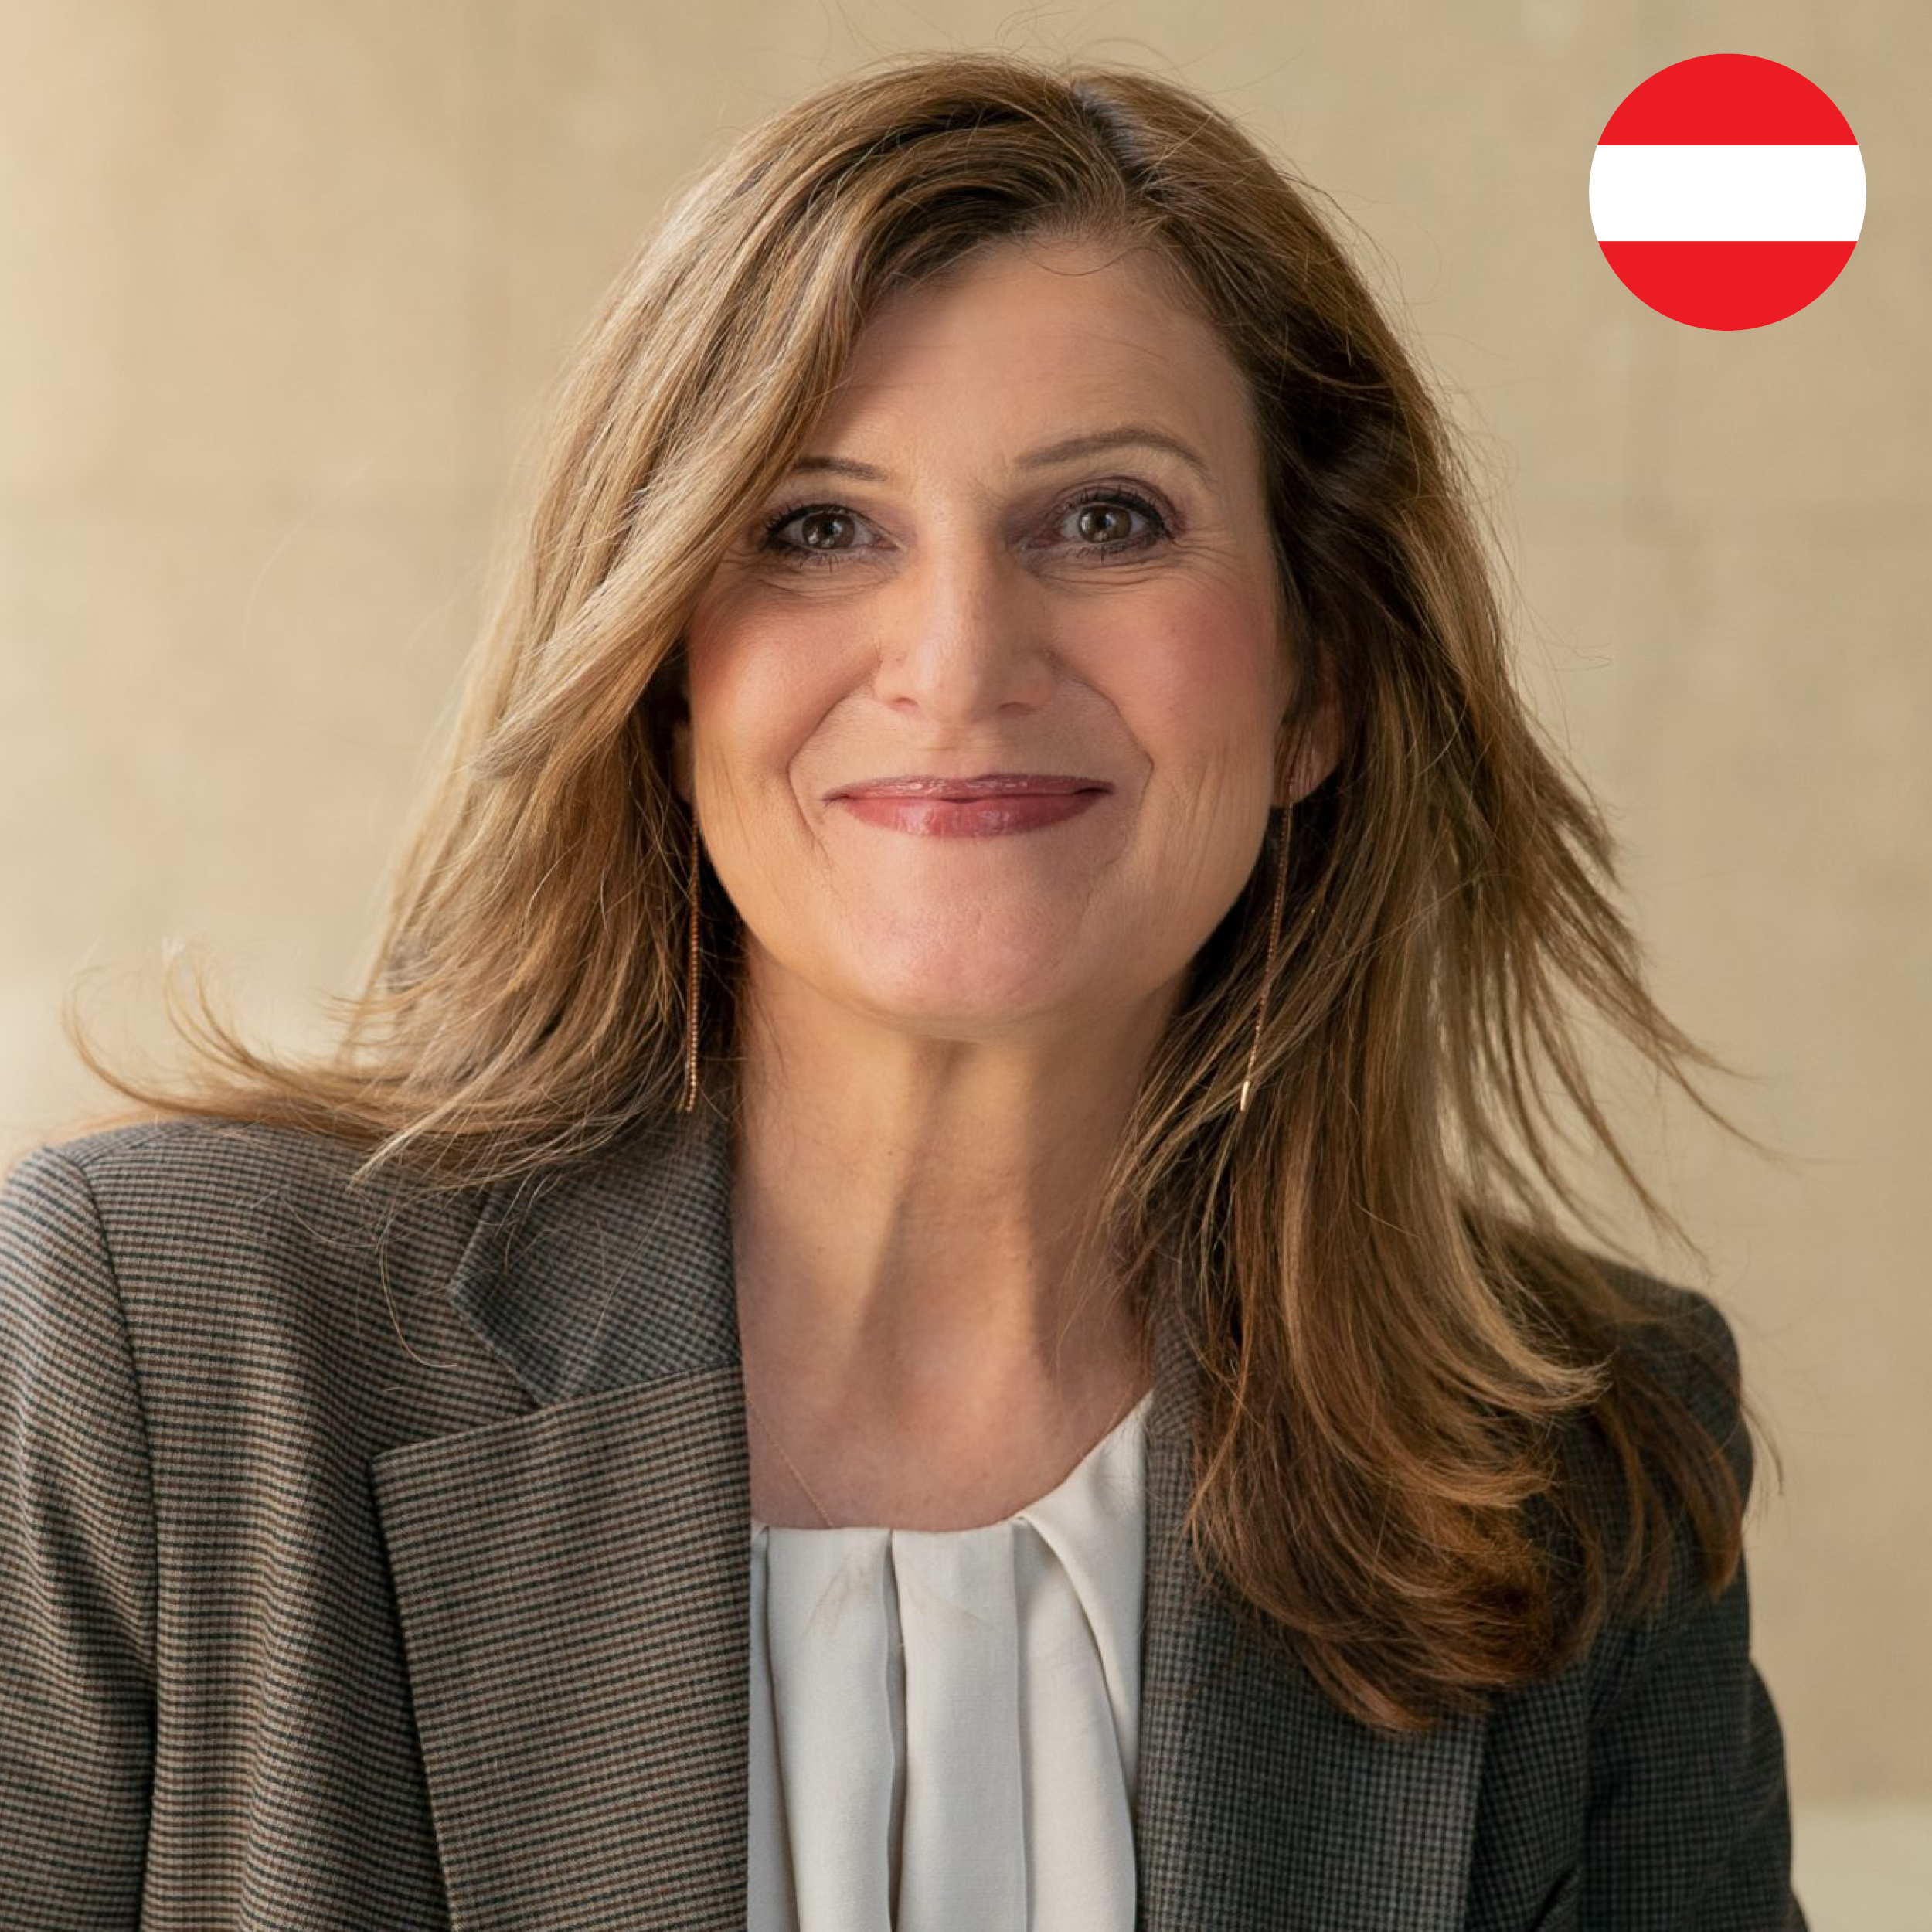 Sonja Watzka